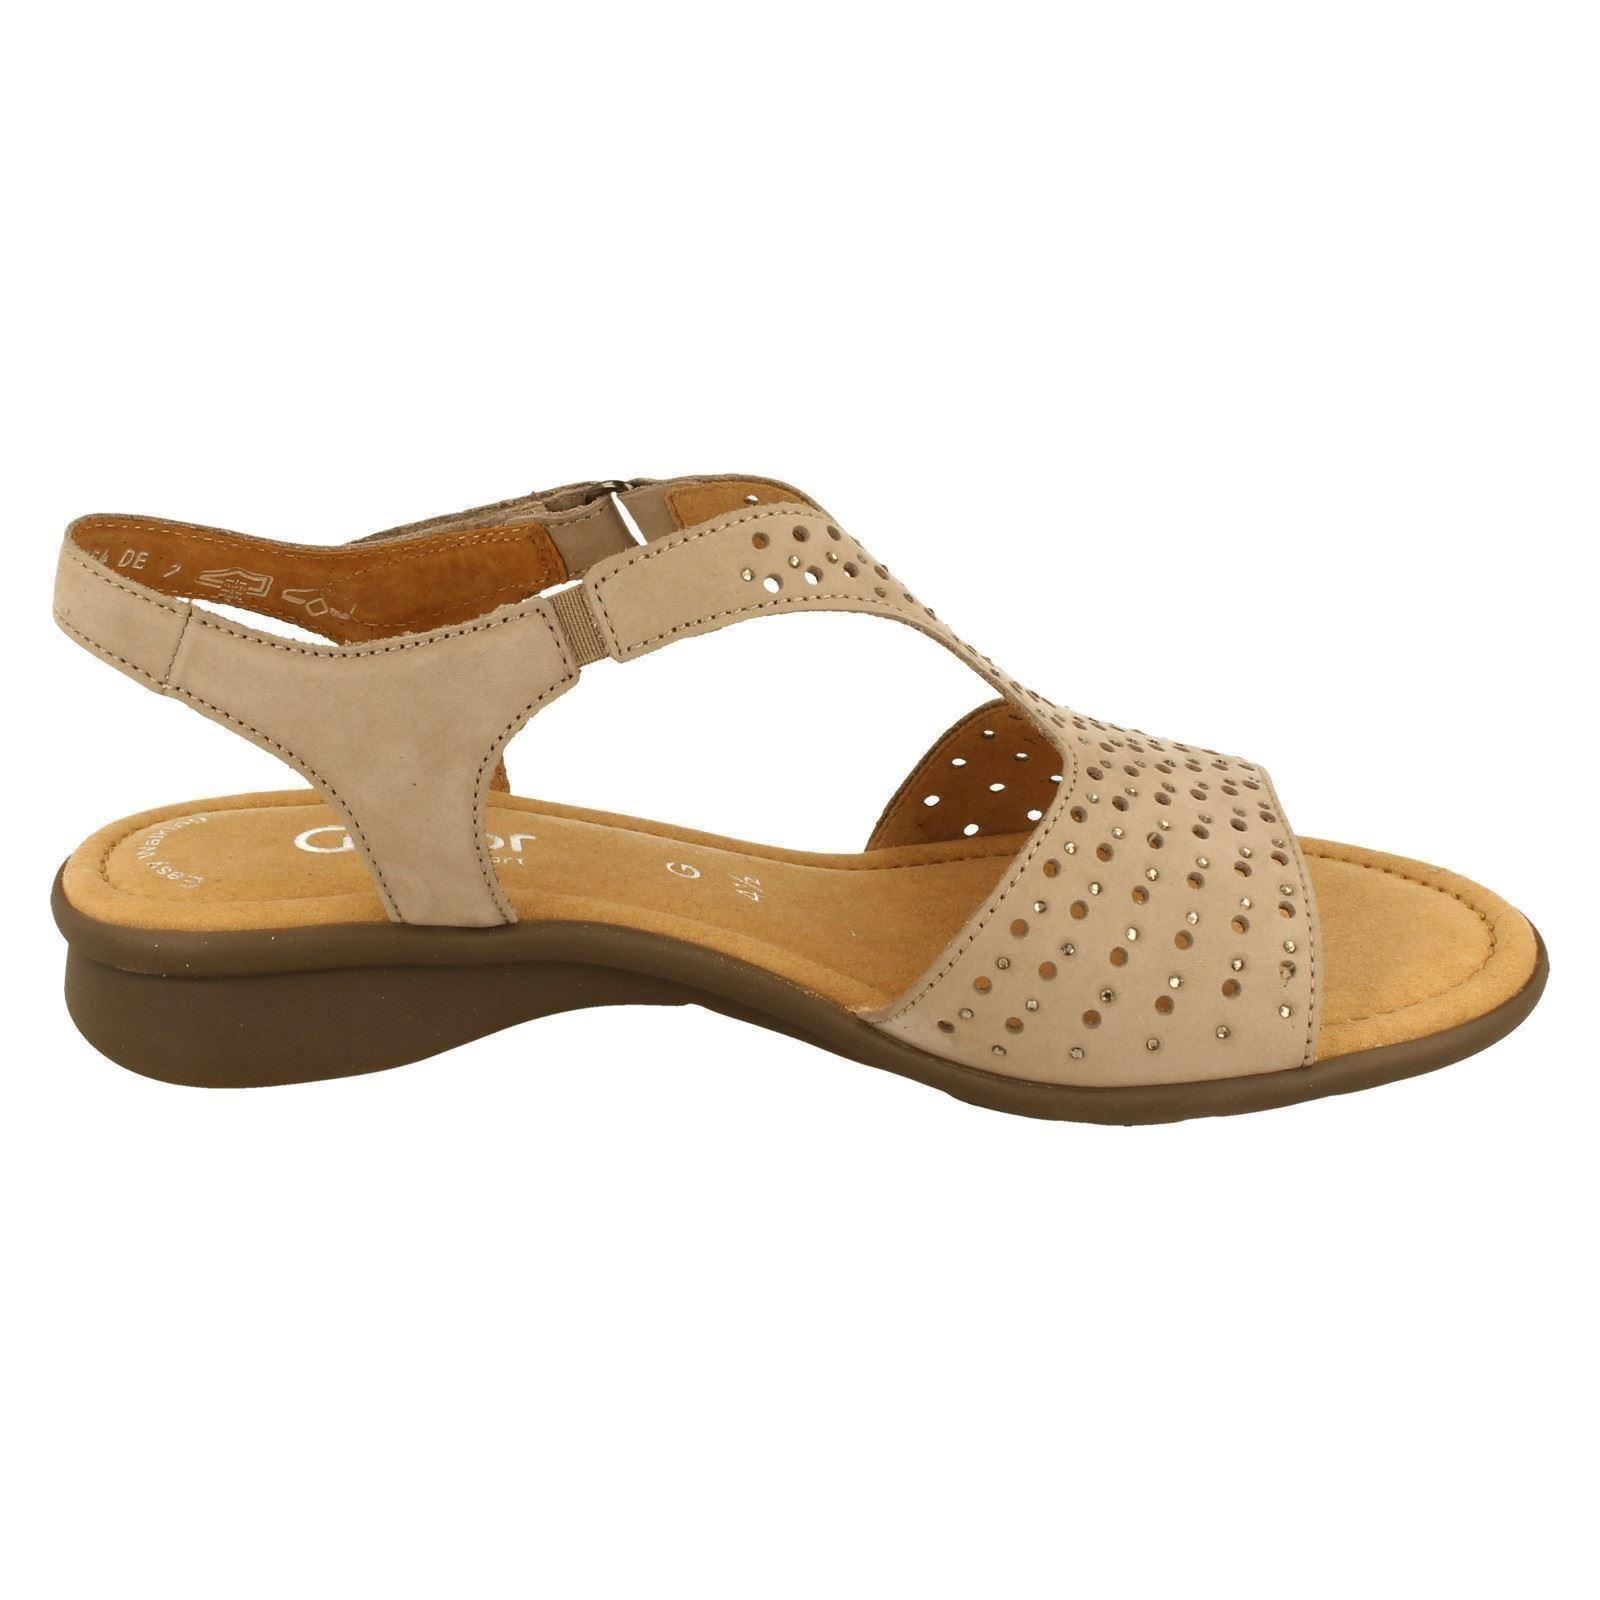 Style Torin Ladies w Gabor taupe Nubuck Visone Sandals 86064 wq4P1p